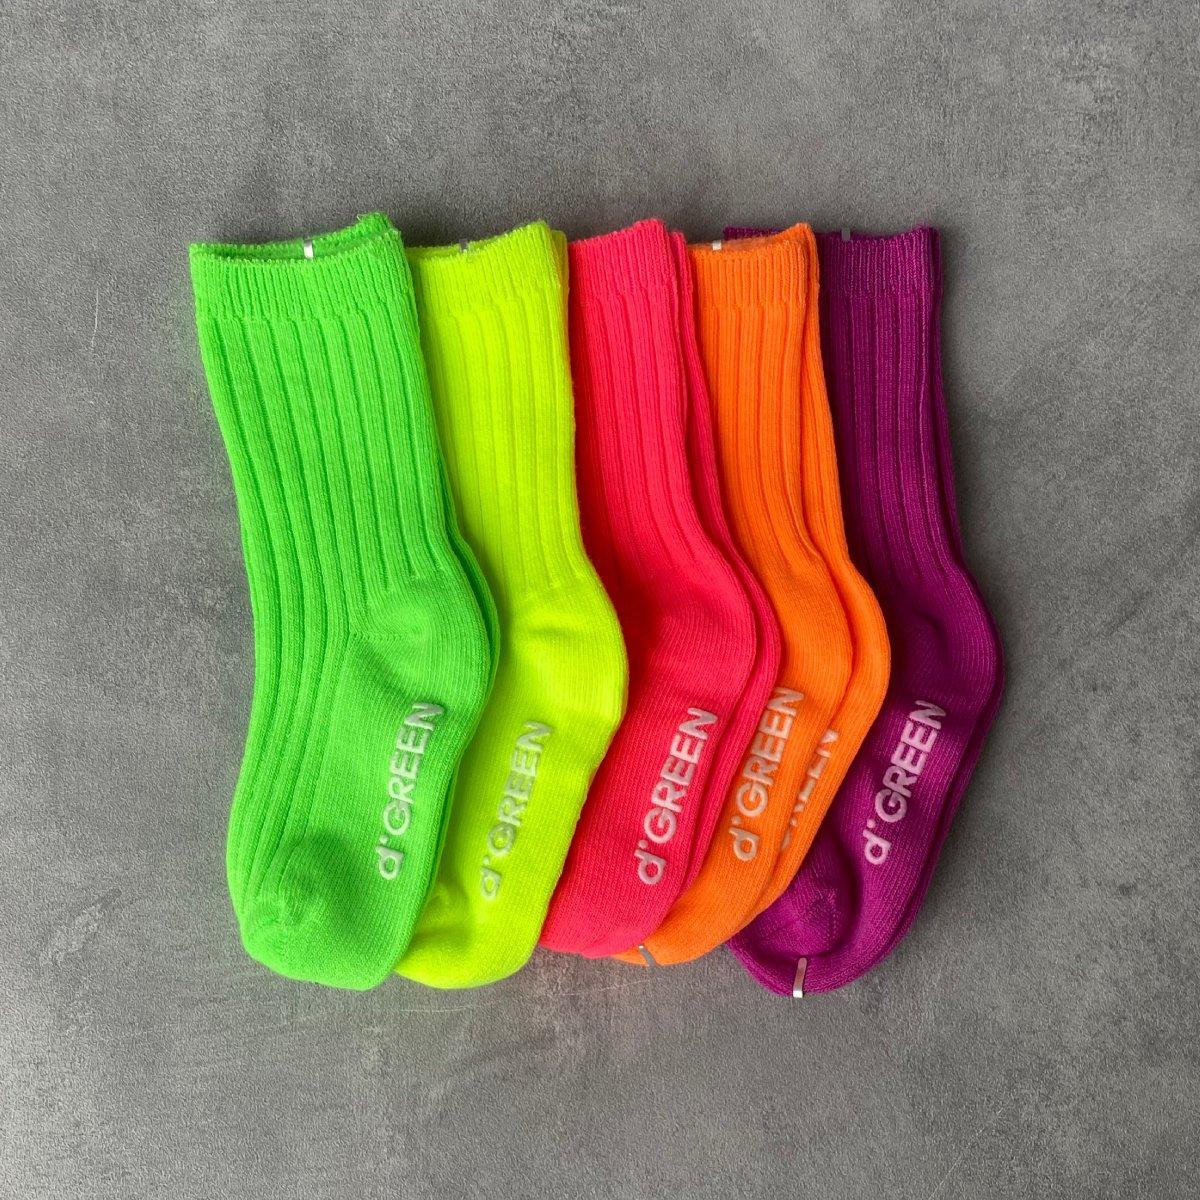 【BABY】Neon Socks 詳細画像1